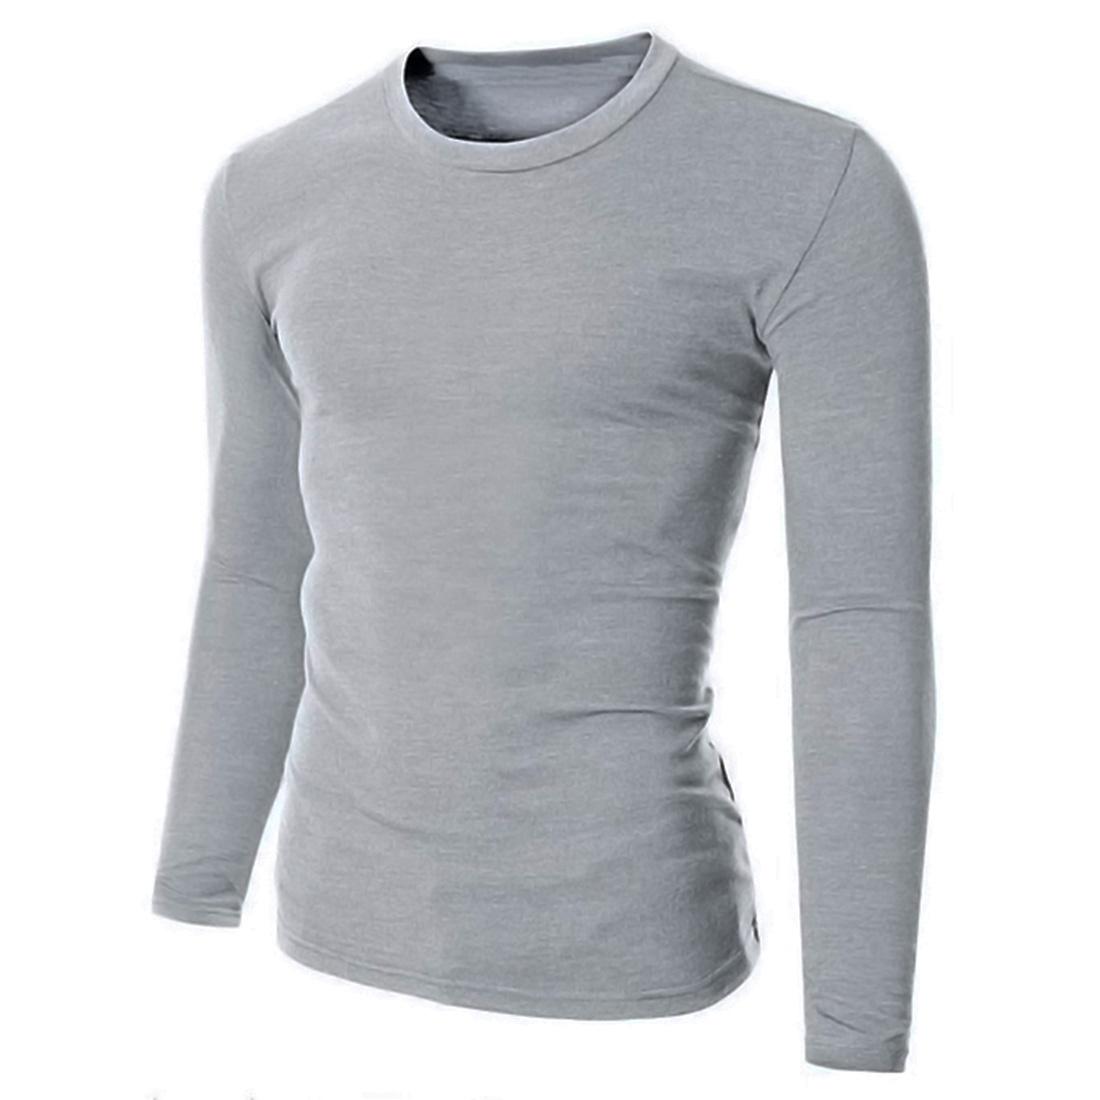 100% Cotton Mens Long Sleeve T-Shirt Basic Tee Crew V Neck Casual ...